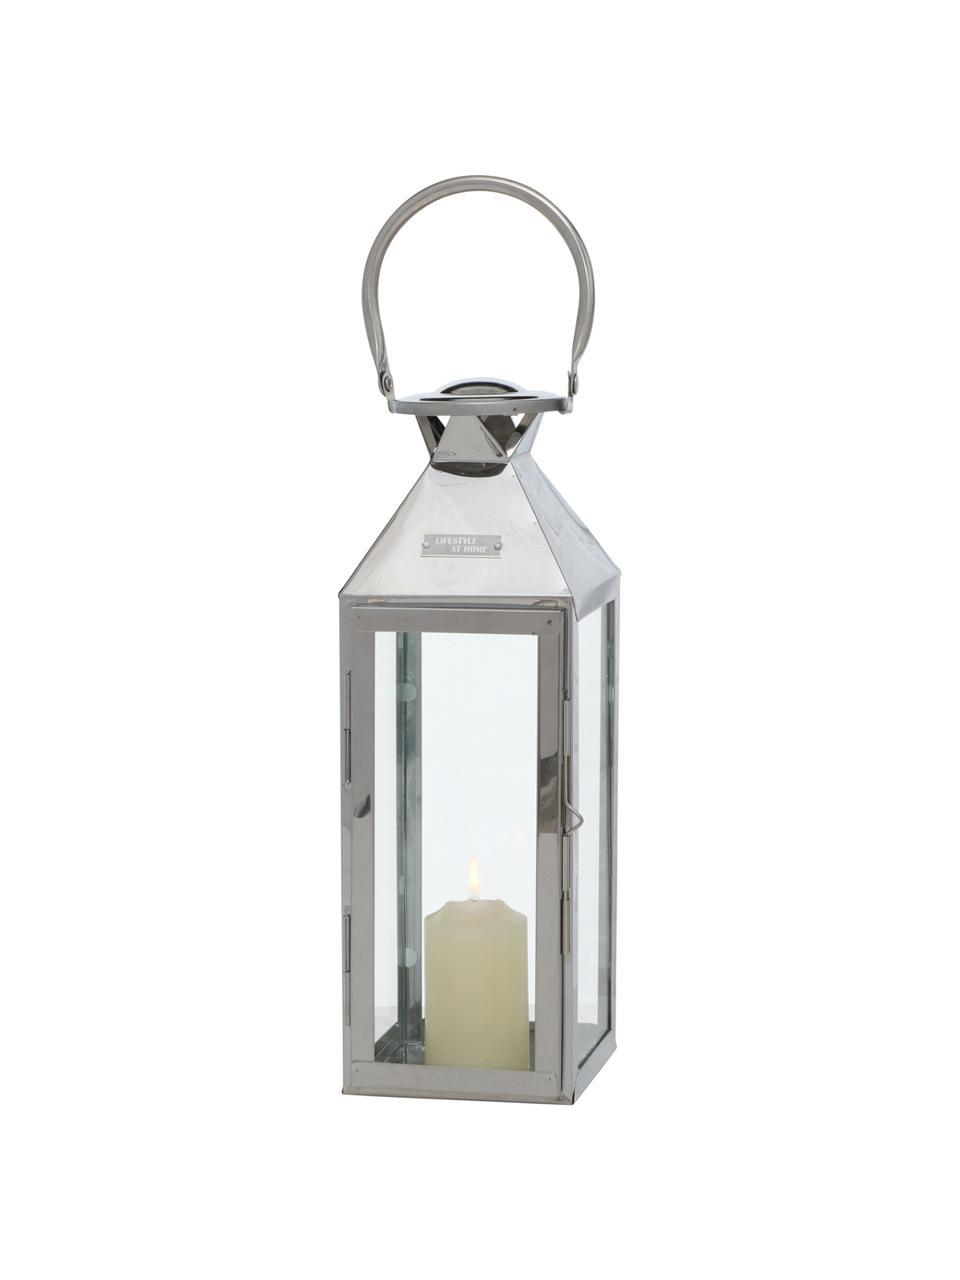 Set 2 lanterne Jason, Struttura: acciaio inossidabile, Acciaio inossidabile, Set in varie misure